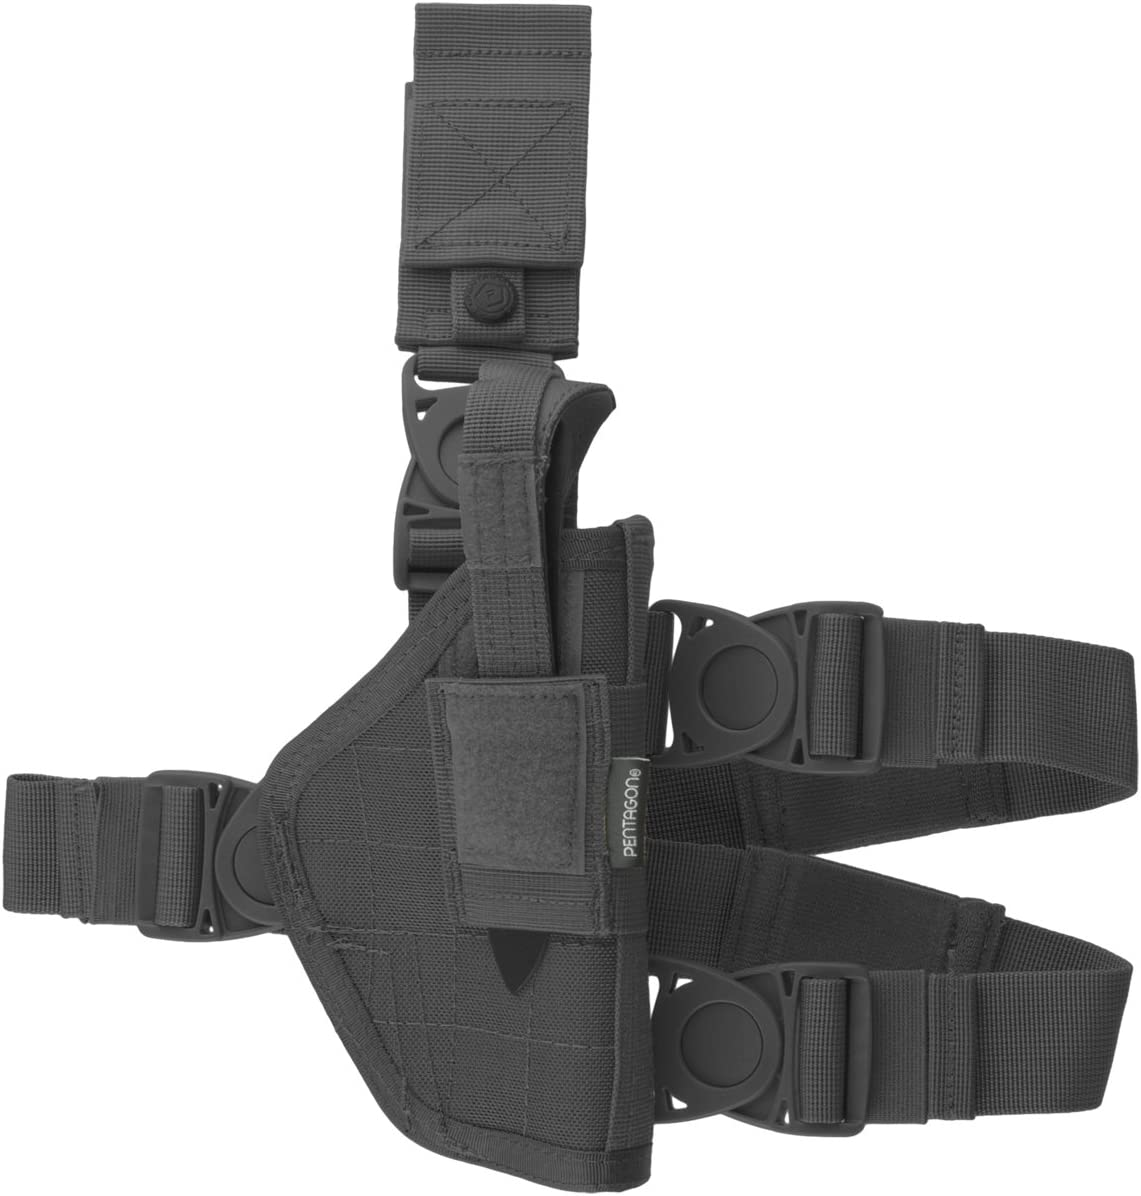 PENTAGON Mamba Pistola Funda Negro